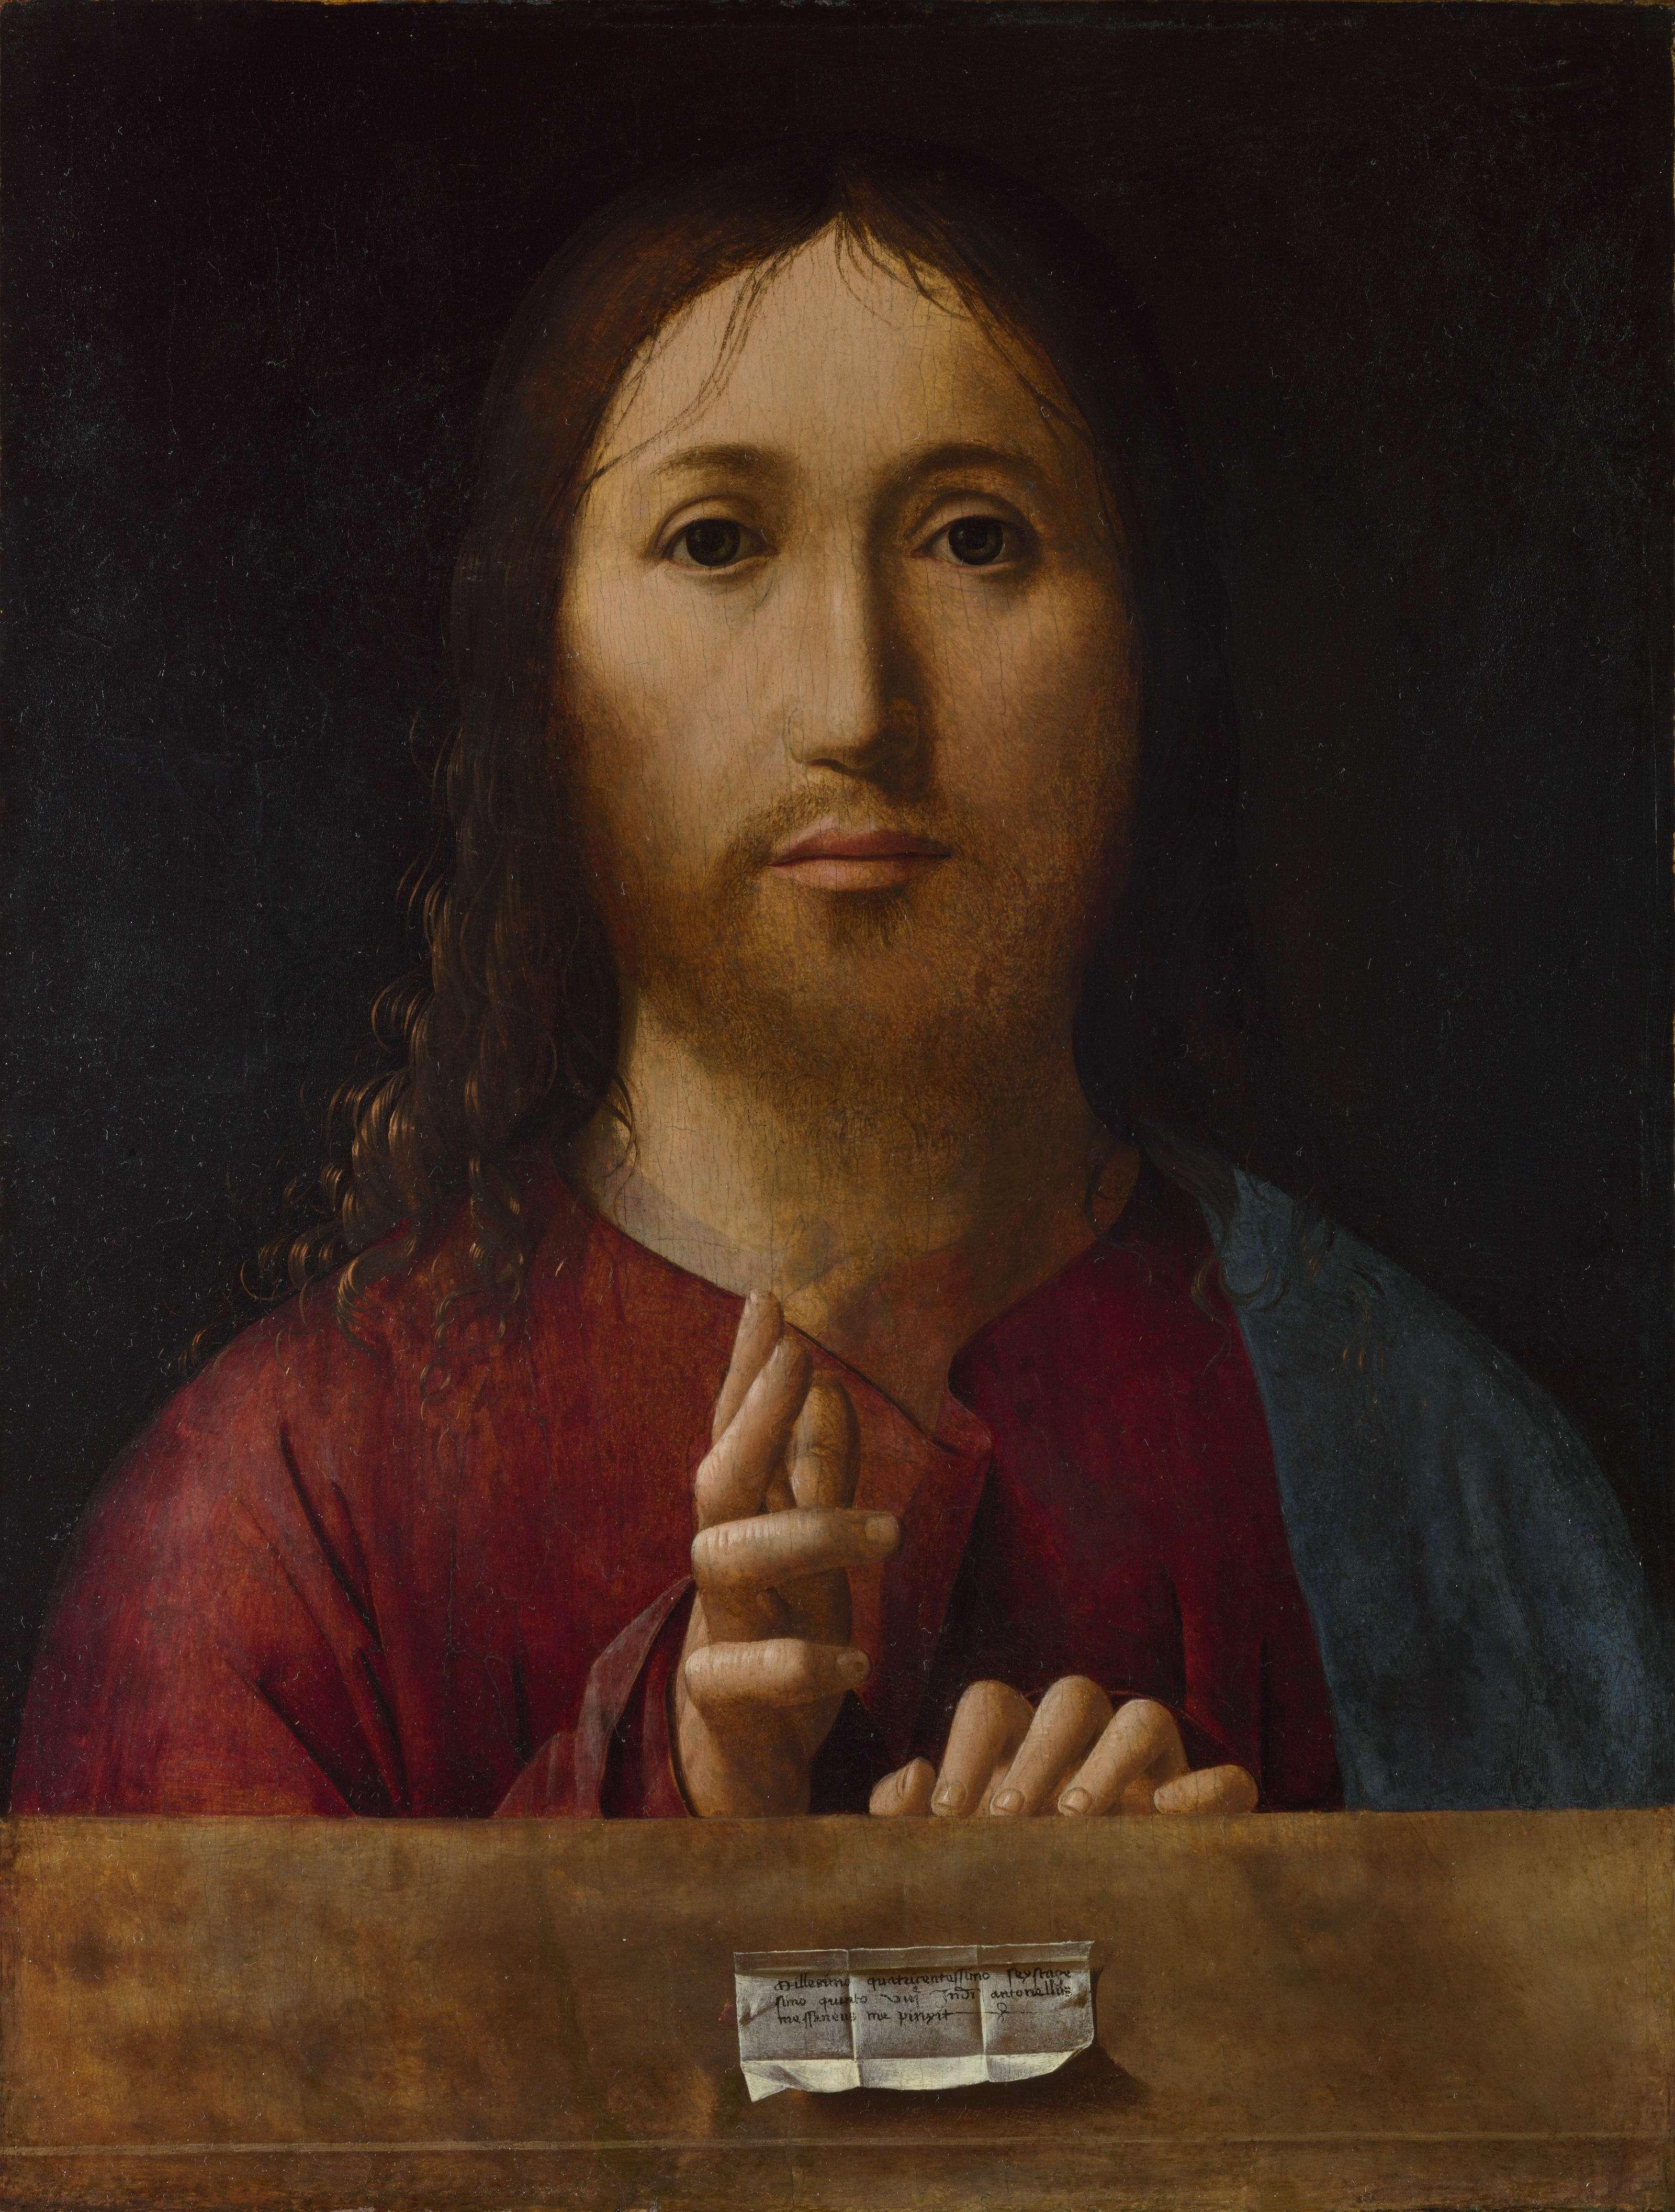 Salvator mundi - Ο Σωτήρας του Κόσμου, 1475, Λονδίνο, Εθνική Πινακοθήκη.